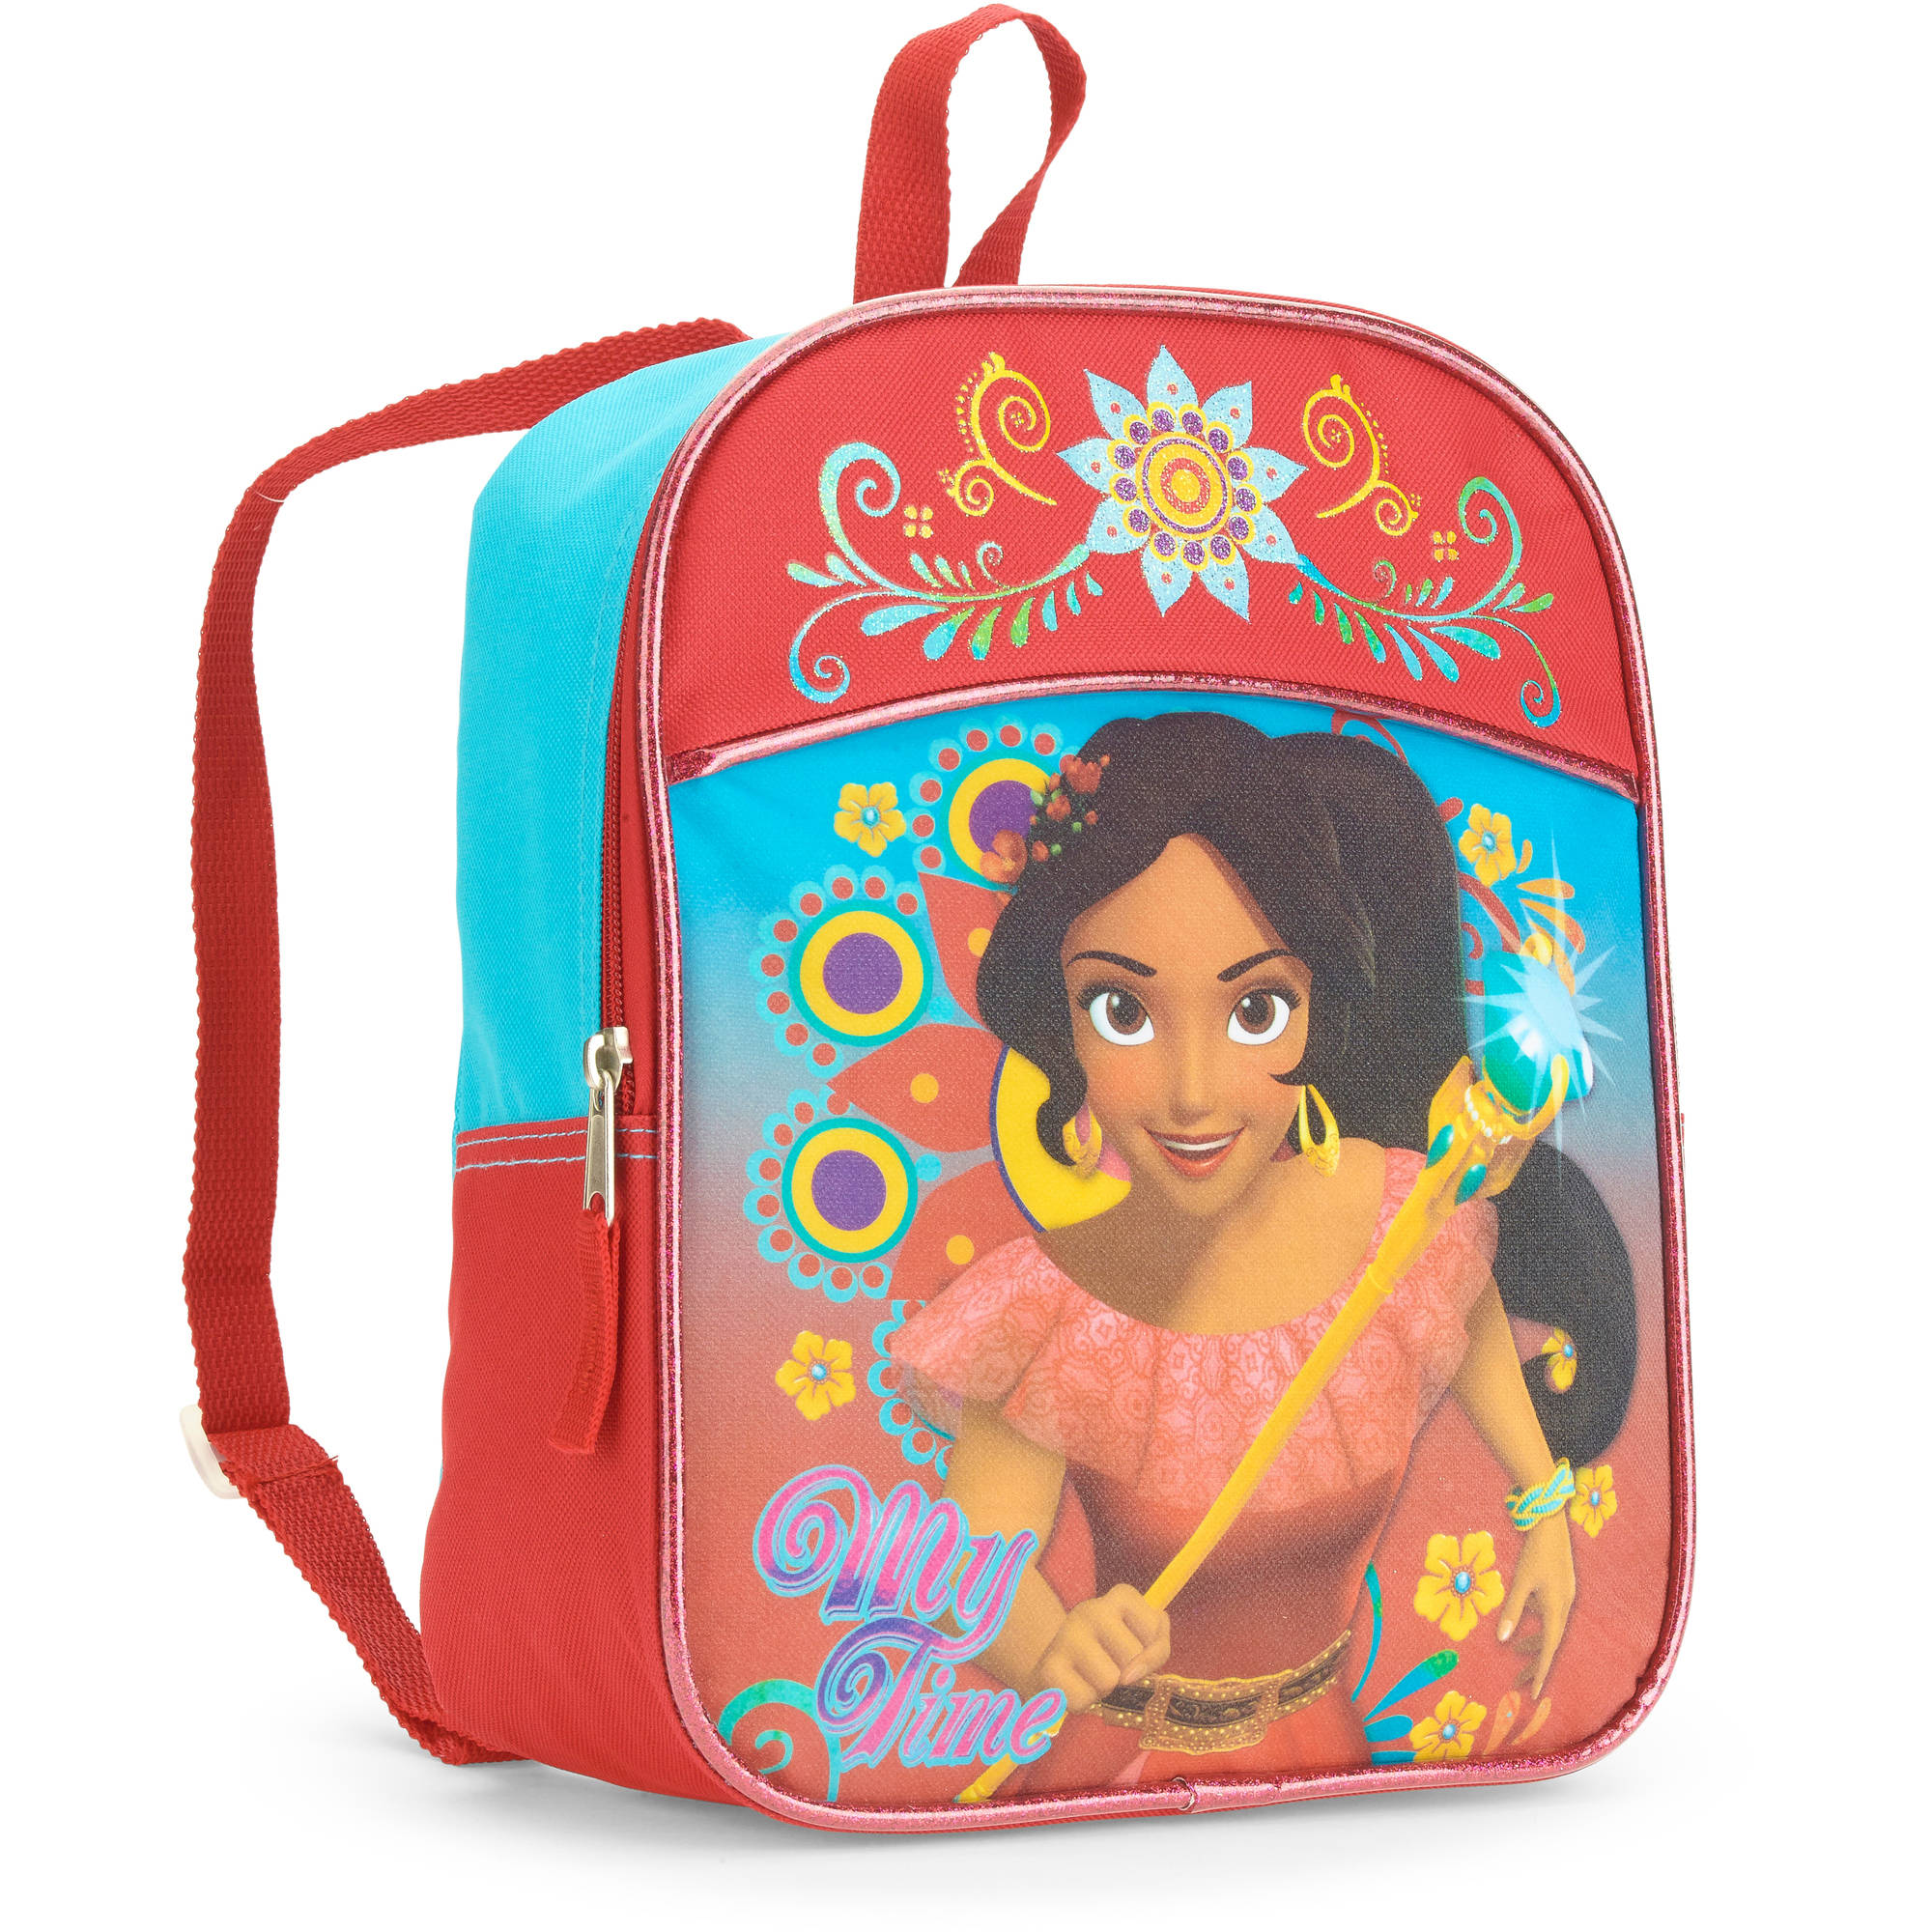 "Disney Elena of Avalor 12"" Mini Backpack"